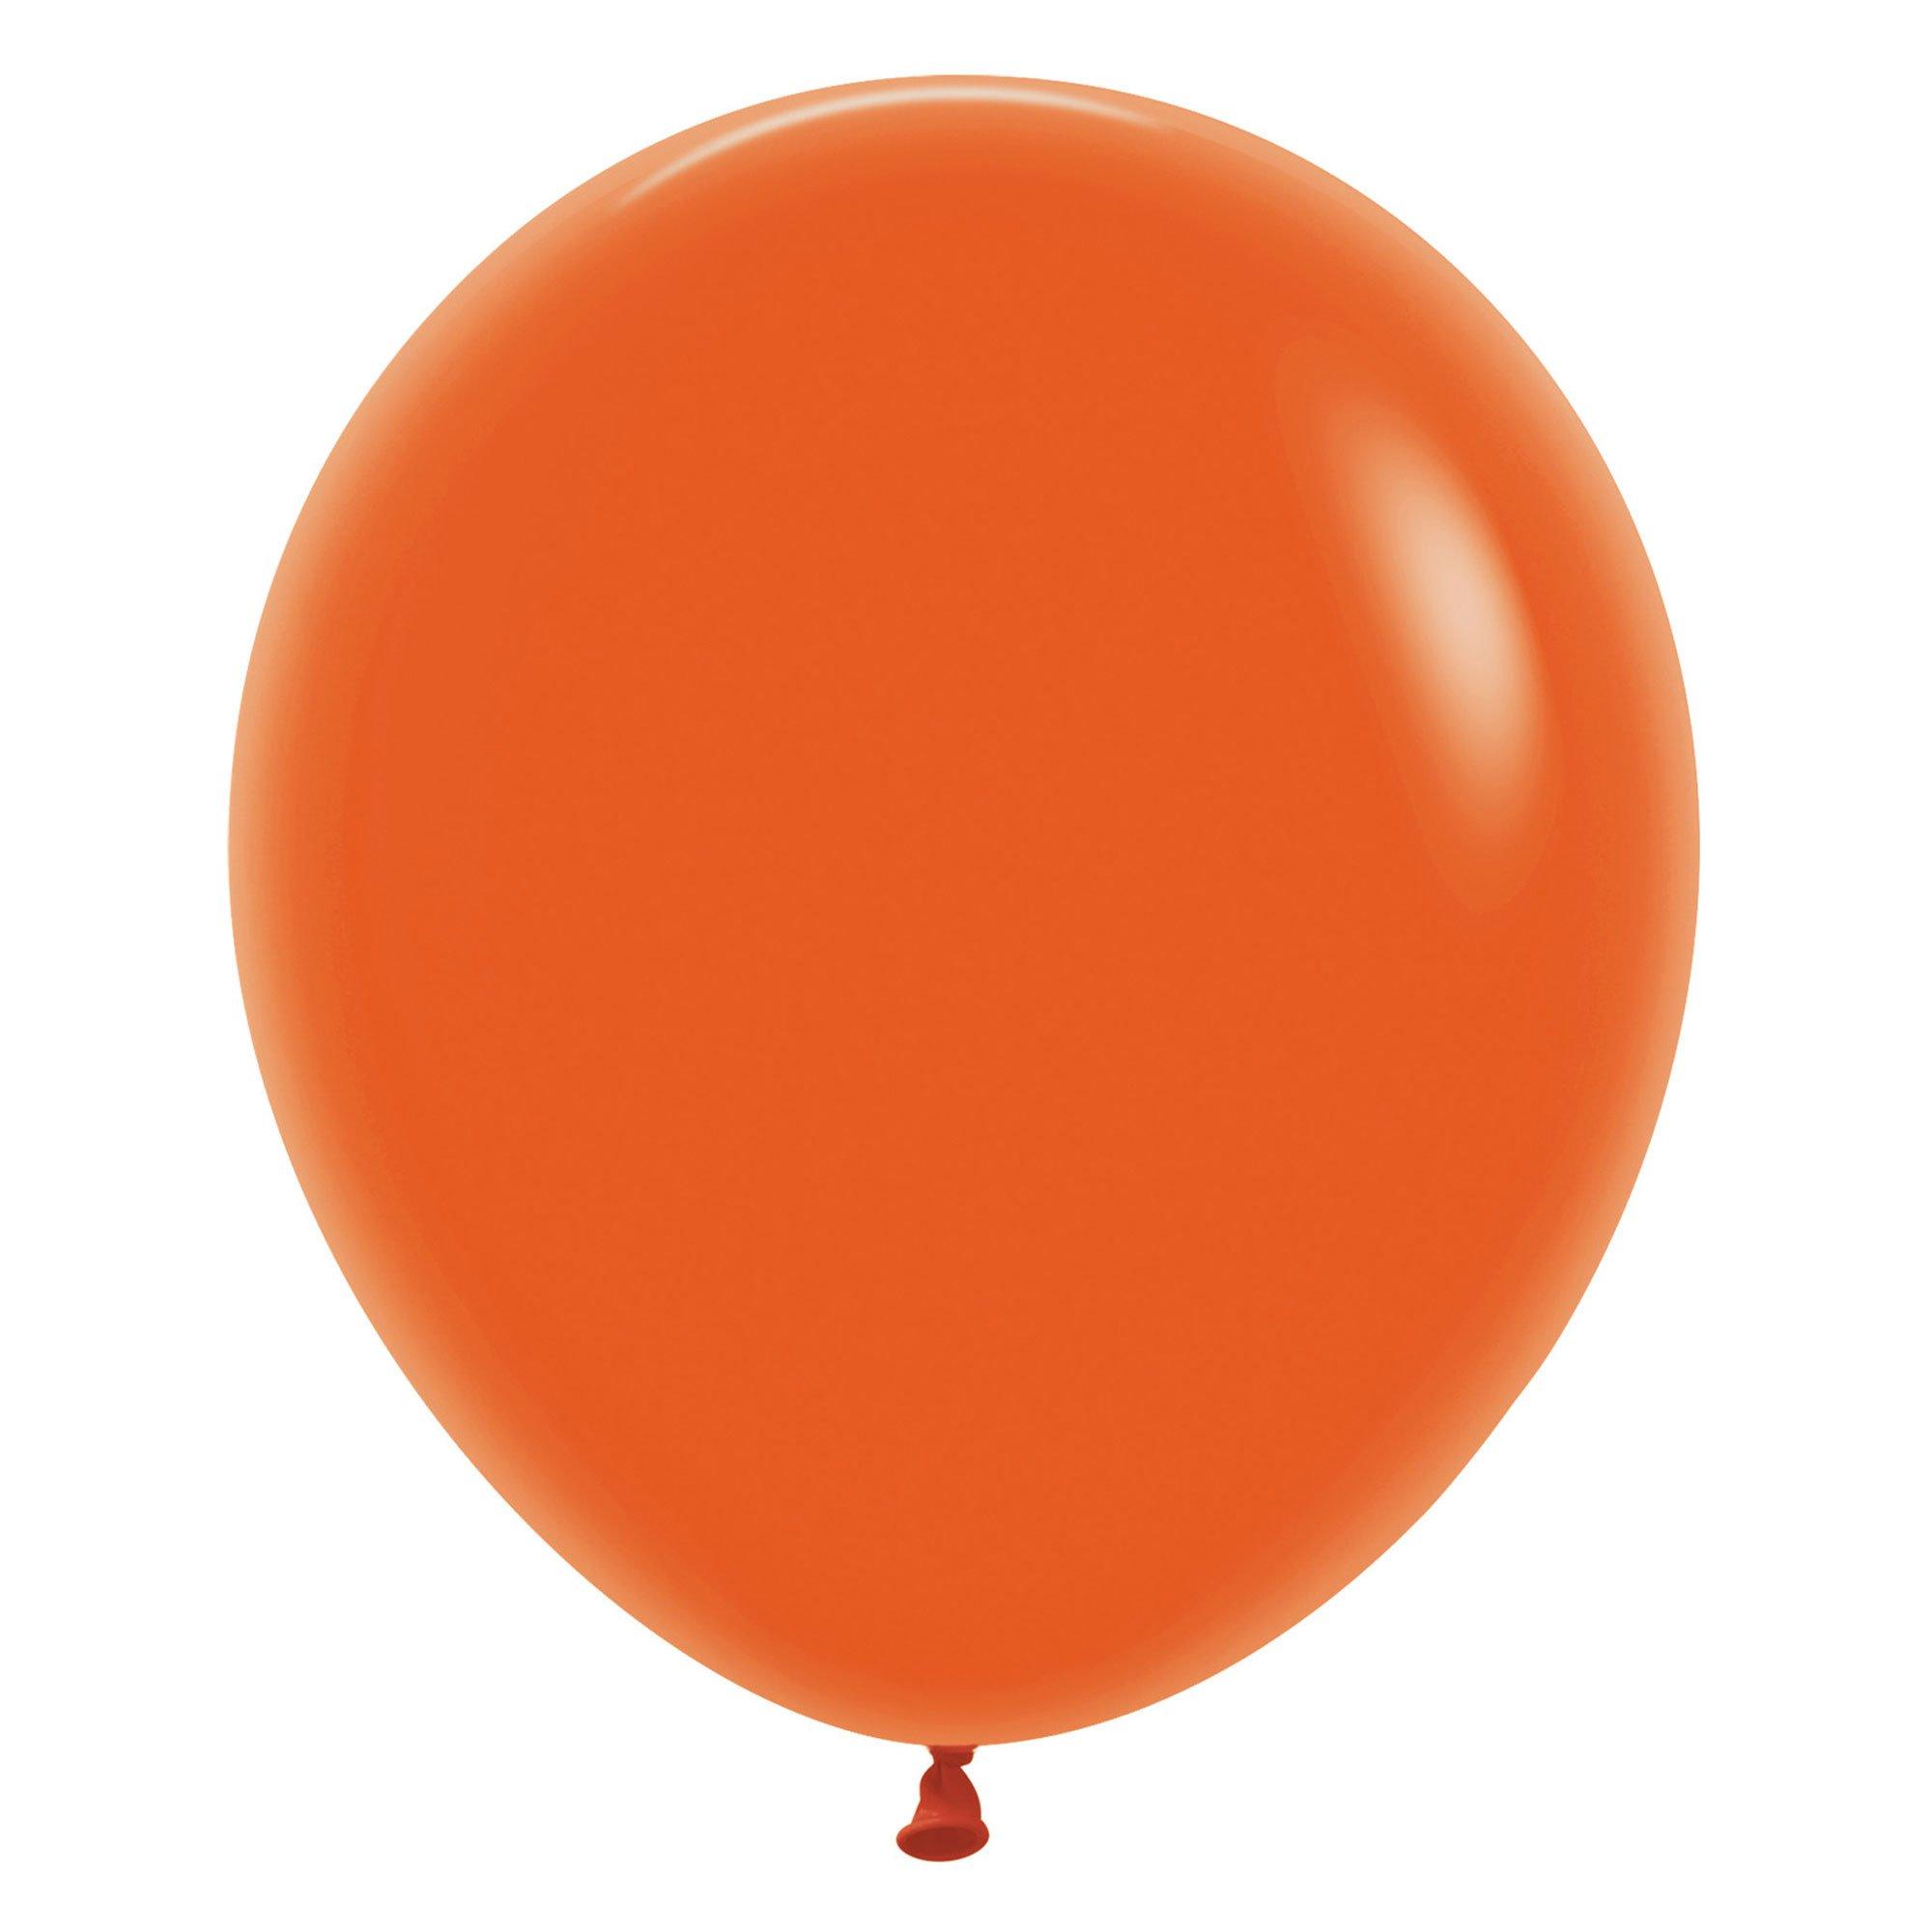 Sempertex 45cm Fashion Orange Latex Balloons 061, 6PK